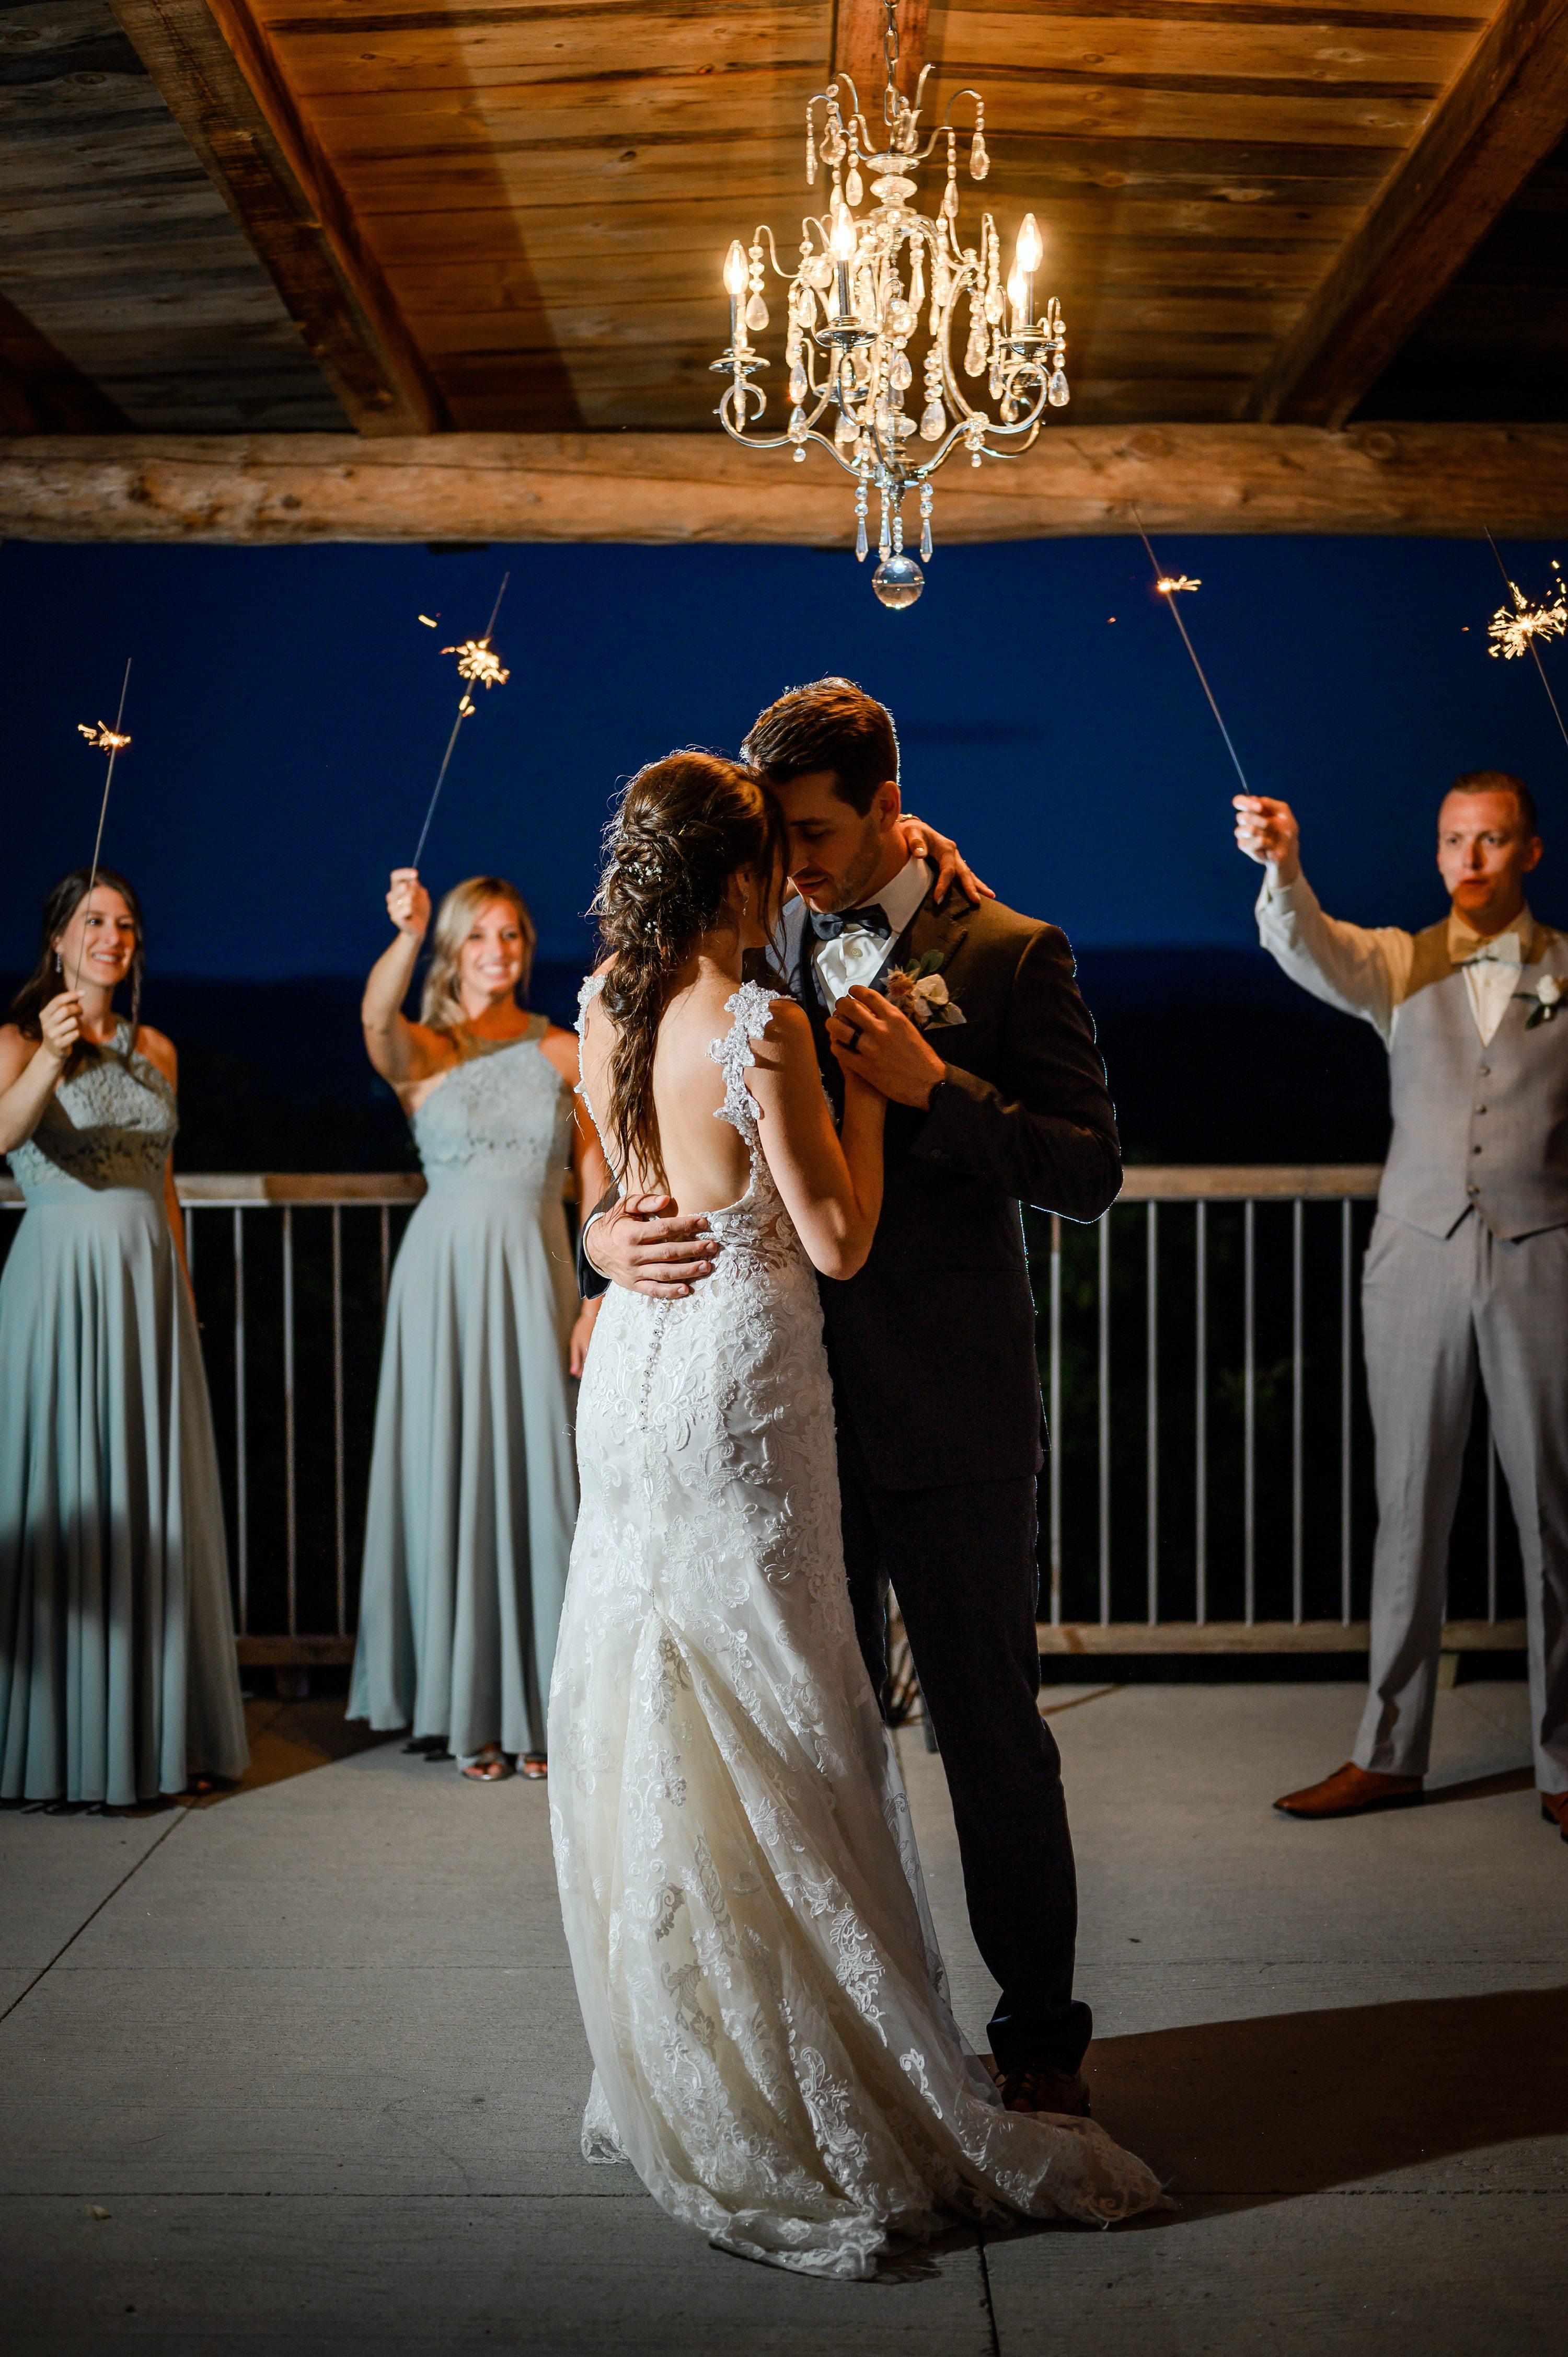 ottawa wedding venue,Photographe de mariage